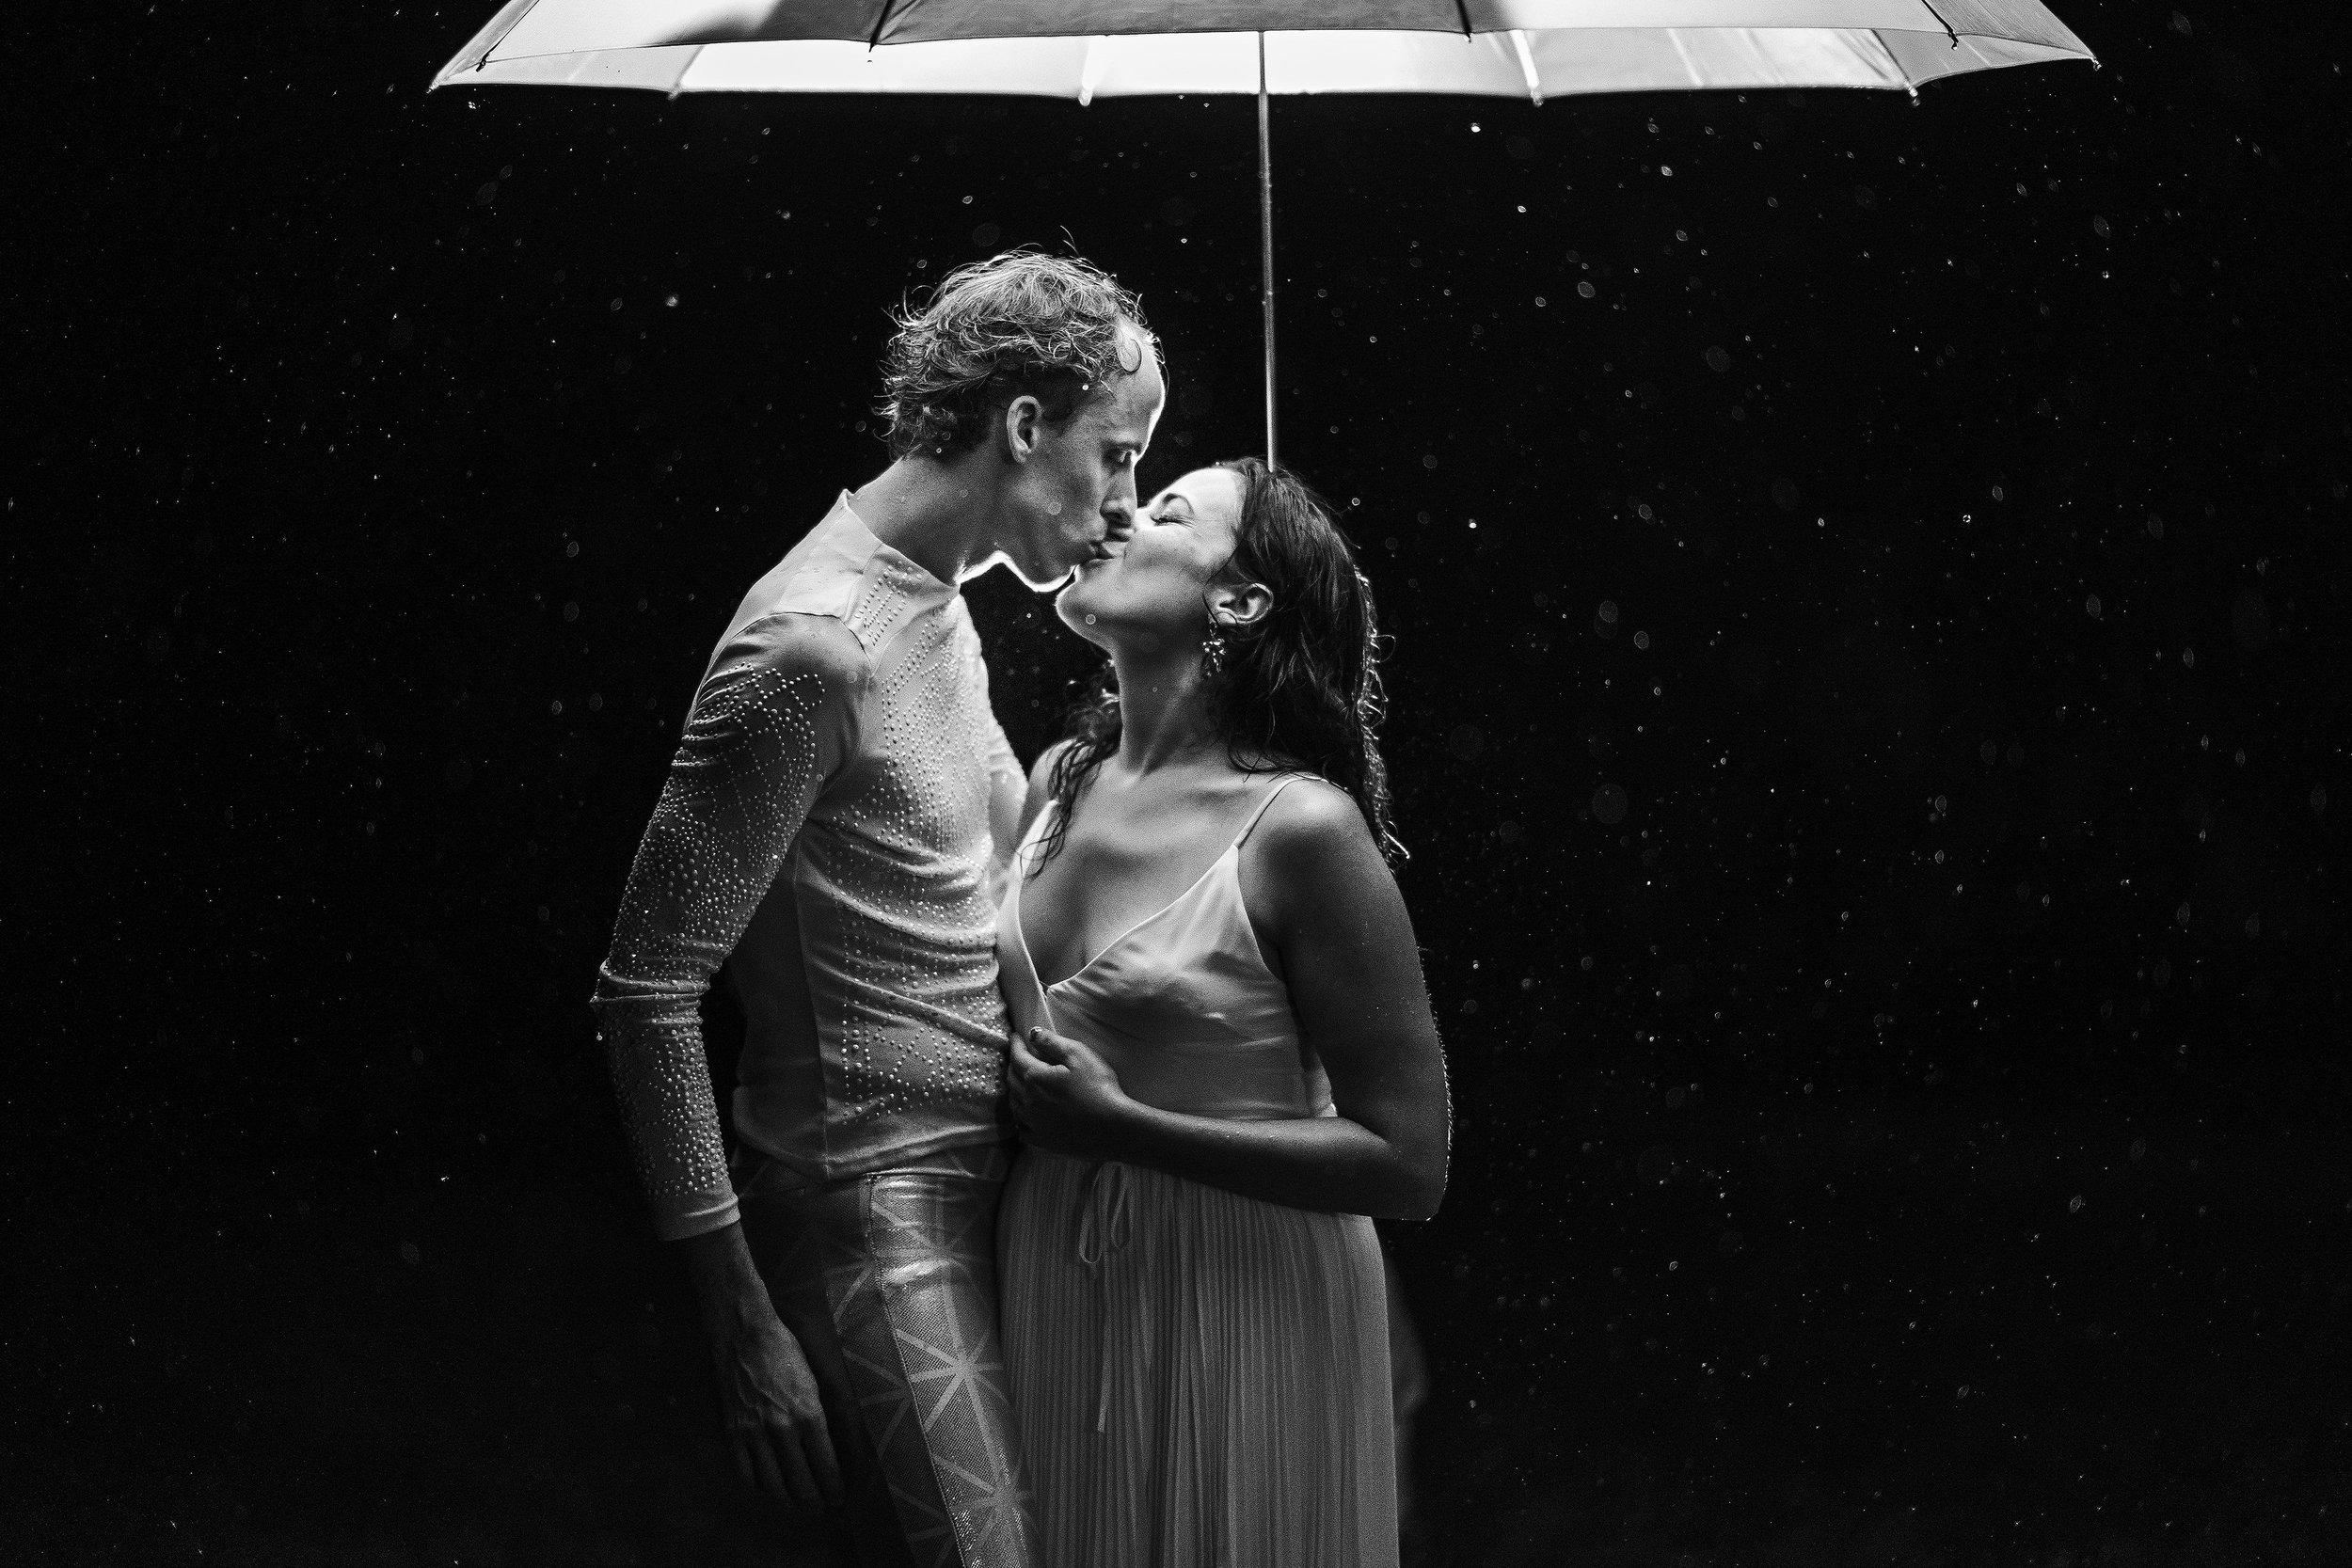 rainy day wedding night photo